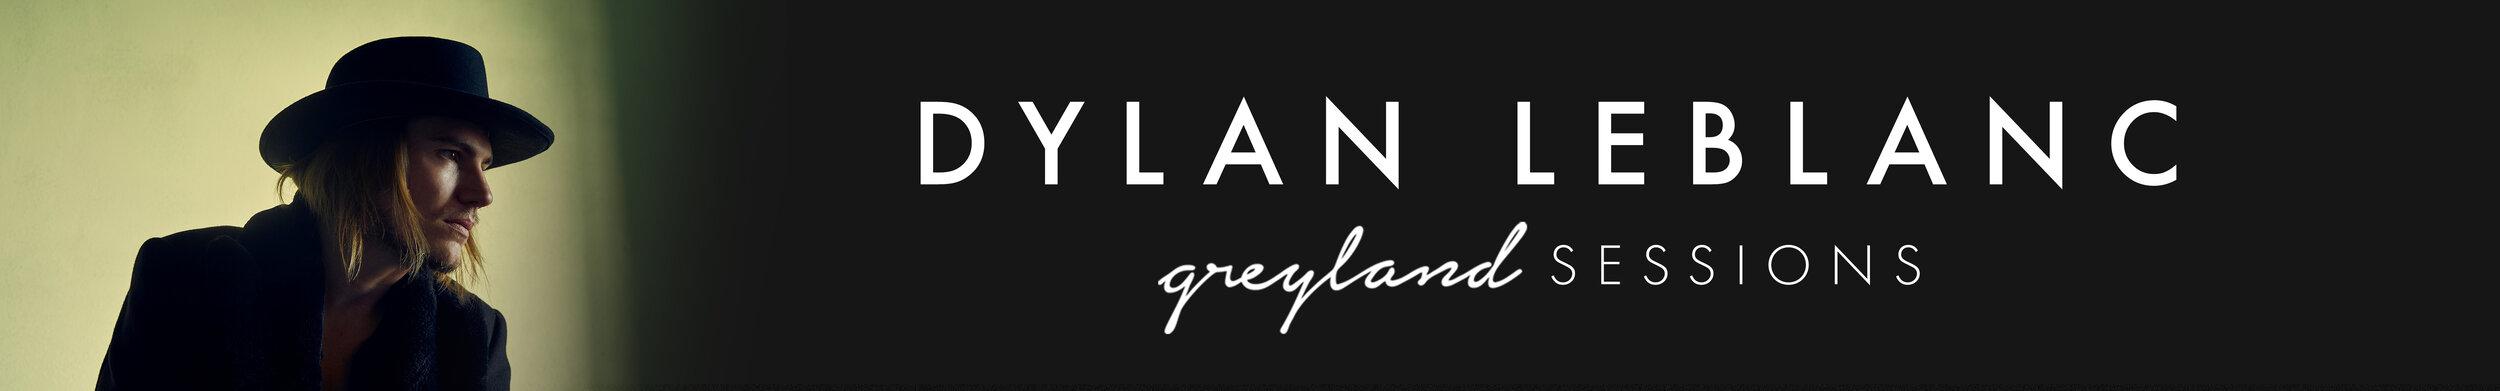 dylan_header_banner.jpg